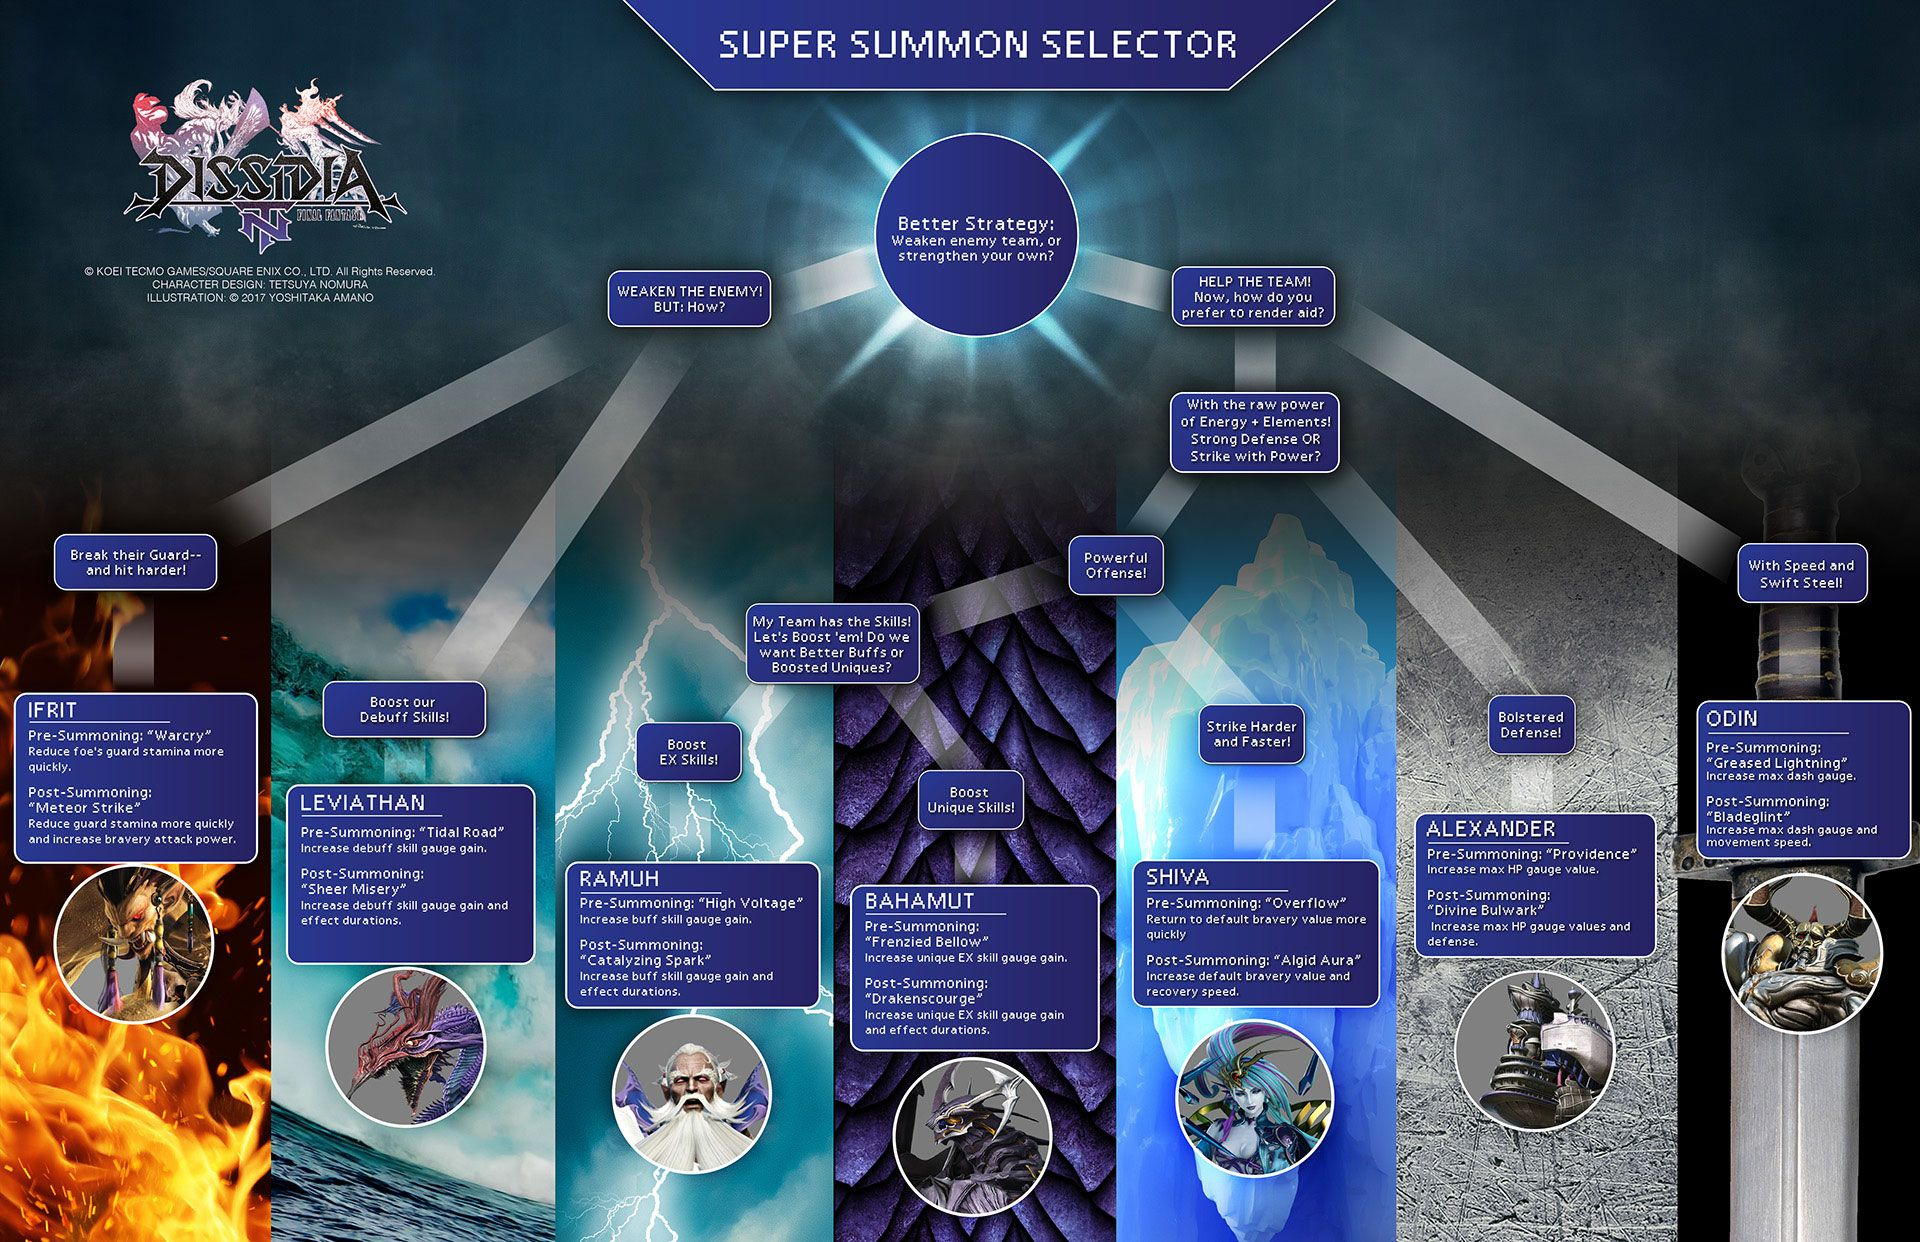 Dissidia Final Fantasy NT for PlayStation 4 | GameStop | PS4 | Final